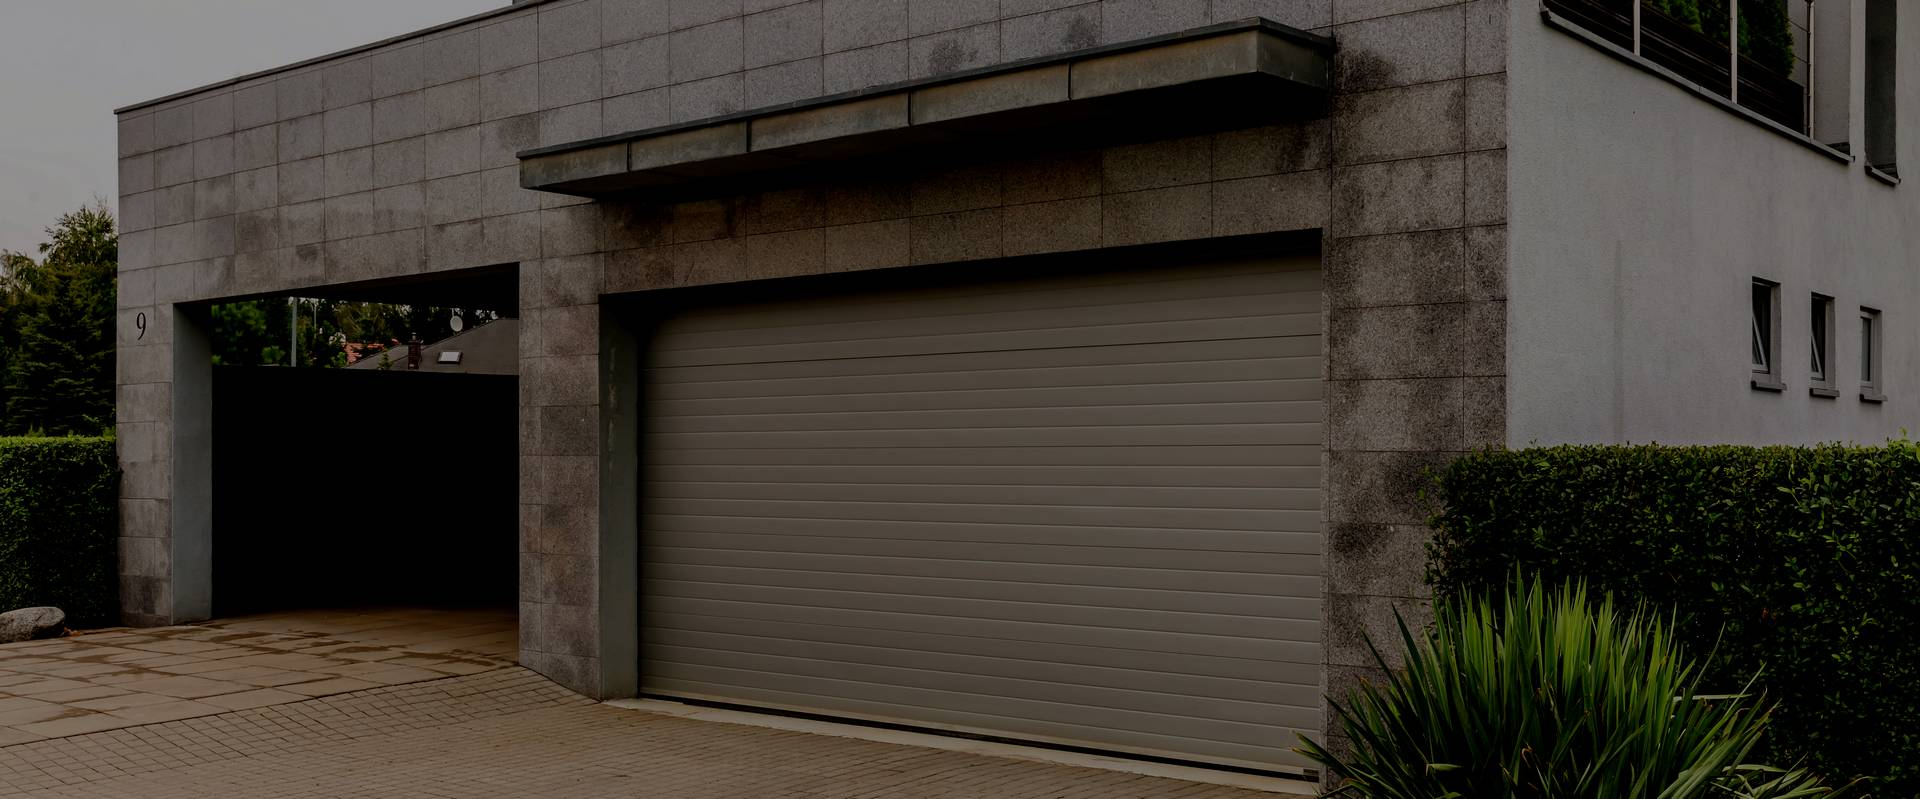 Calgary Garage Door Repair Services Calgary 24 7